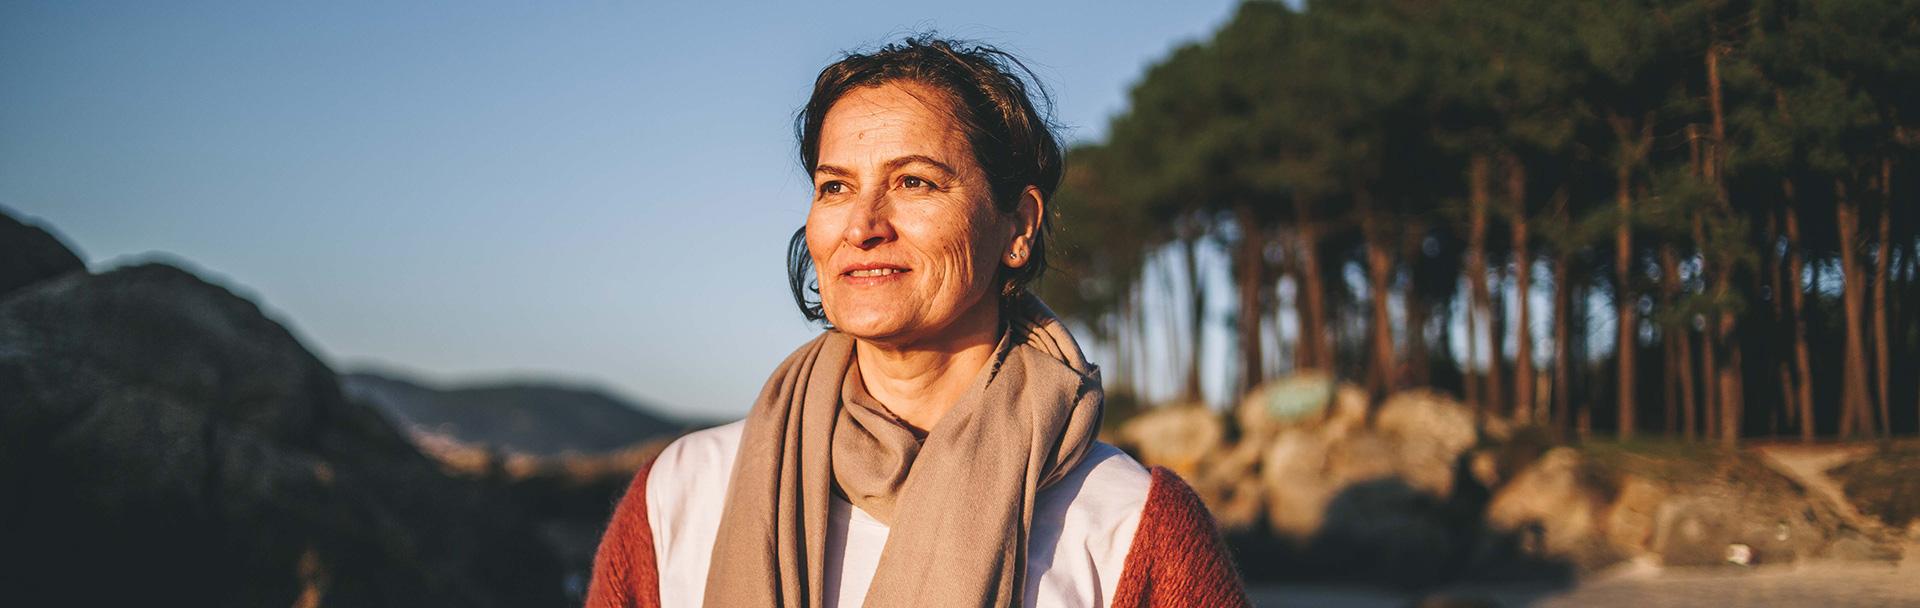 Raquel Flores Mindfulness Activo